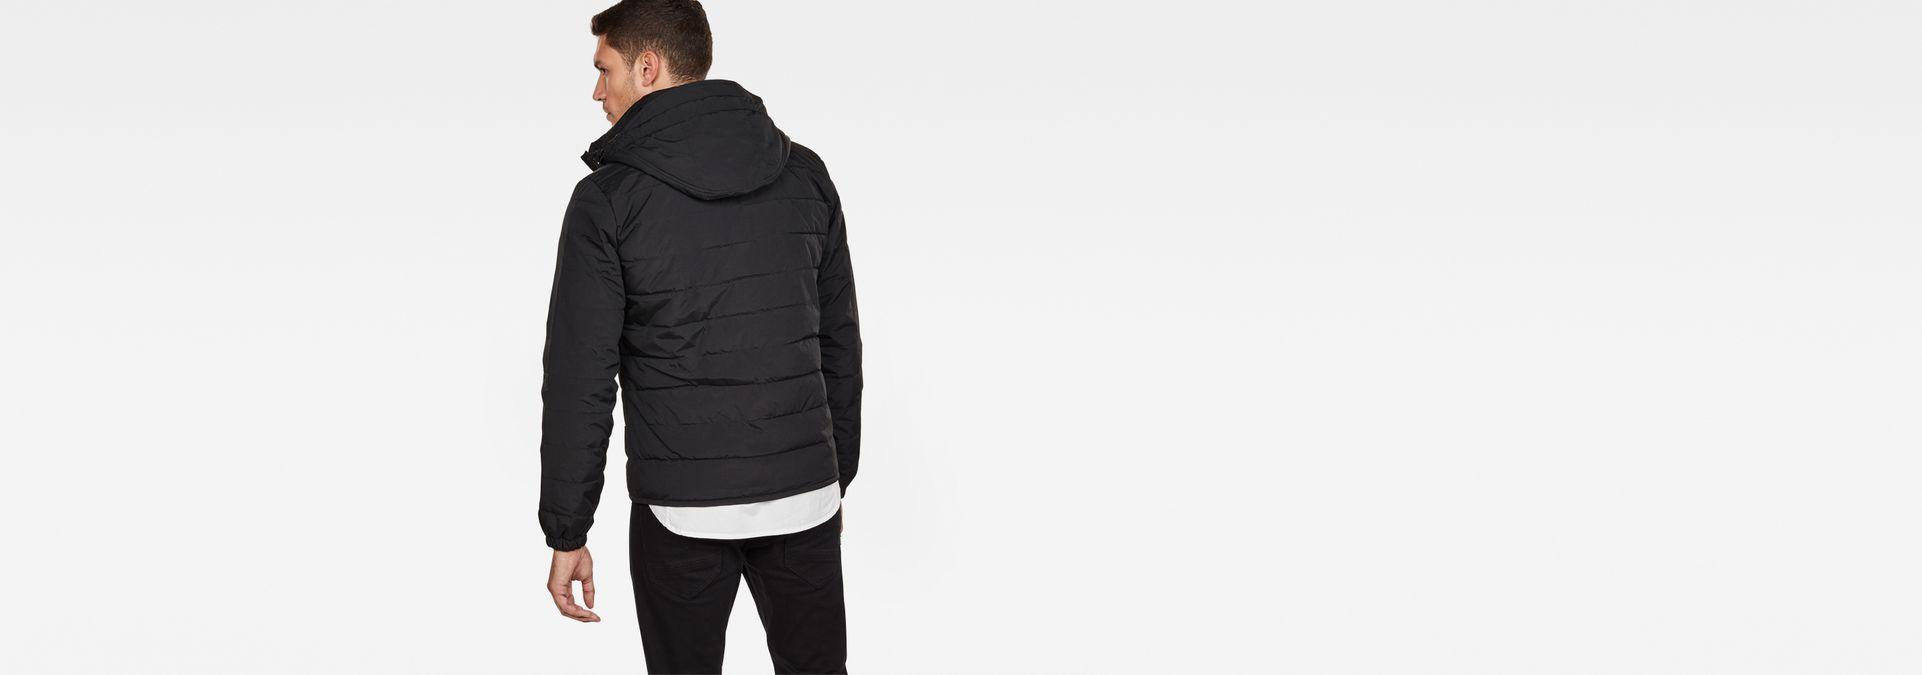 Attacc Quilted Hooded Jacket   Dark Black   Hommes   G Star RAW®